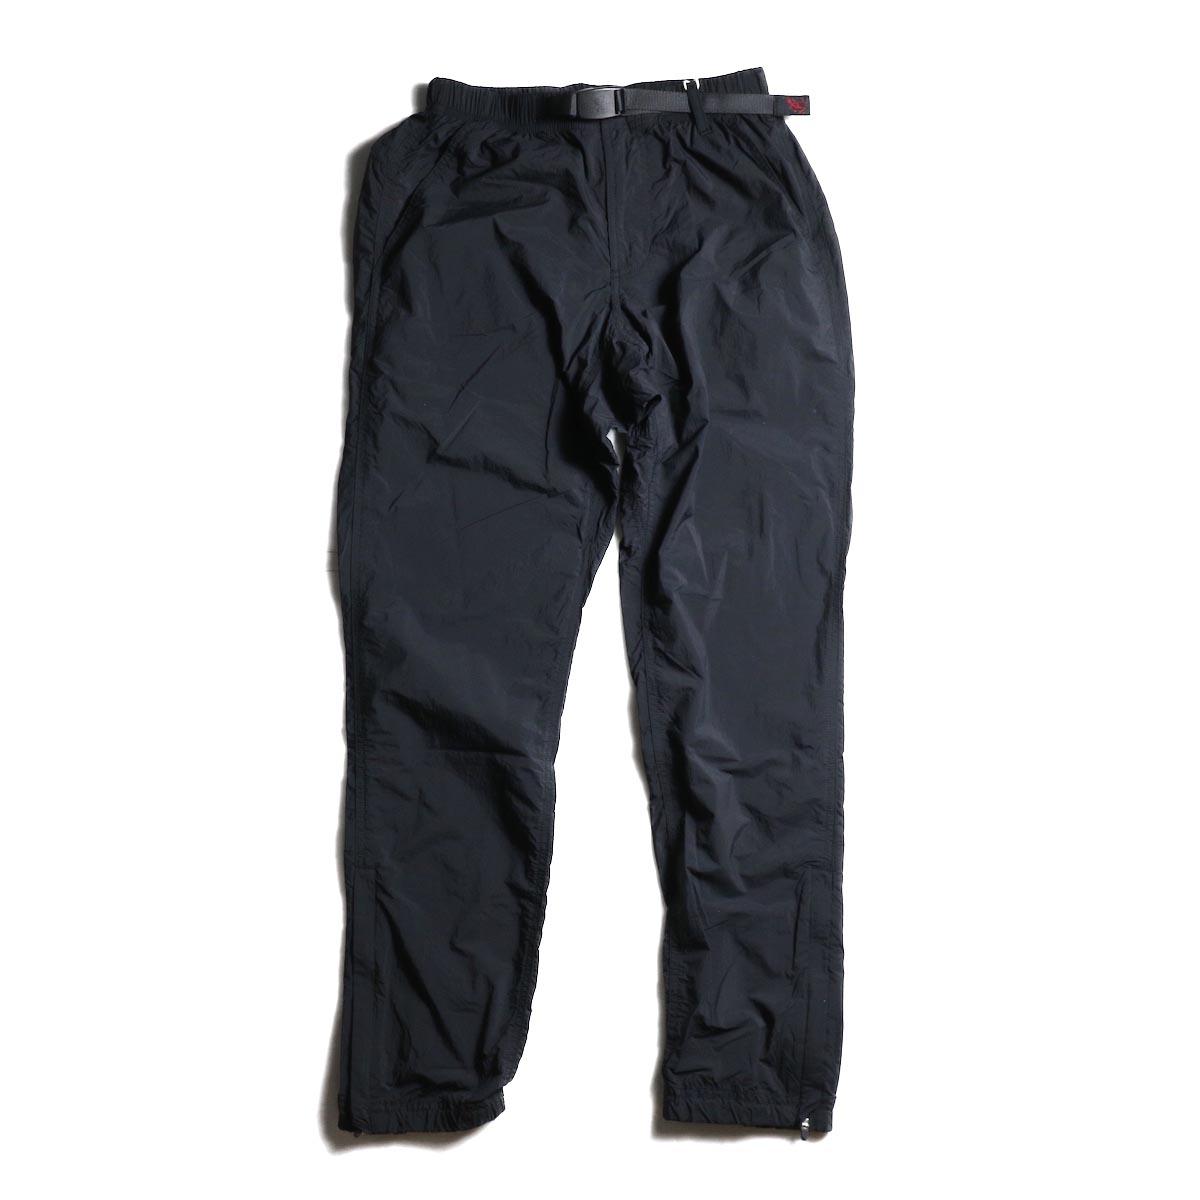 GRAMICCI / Packable Truck Pants (Black)